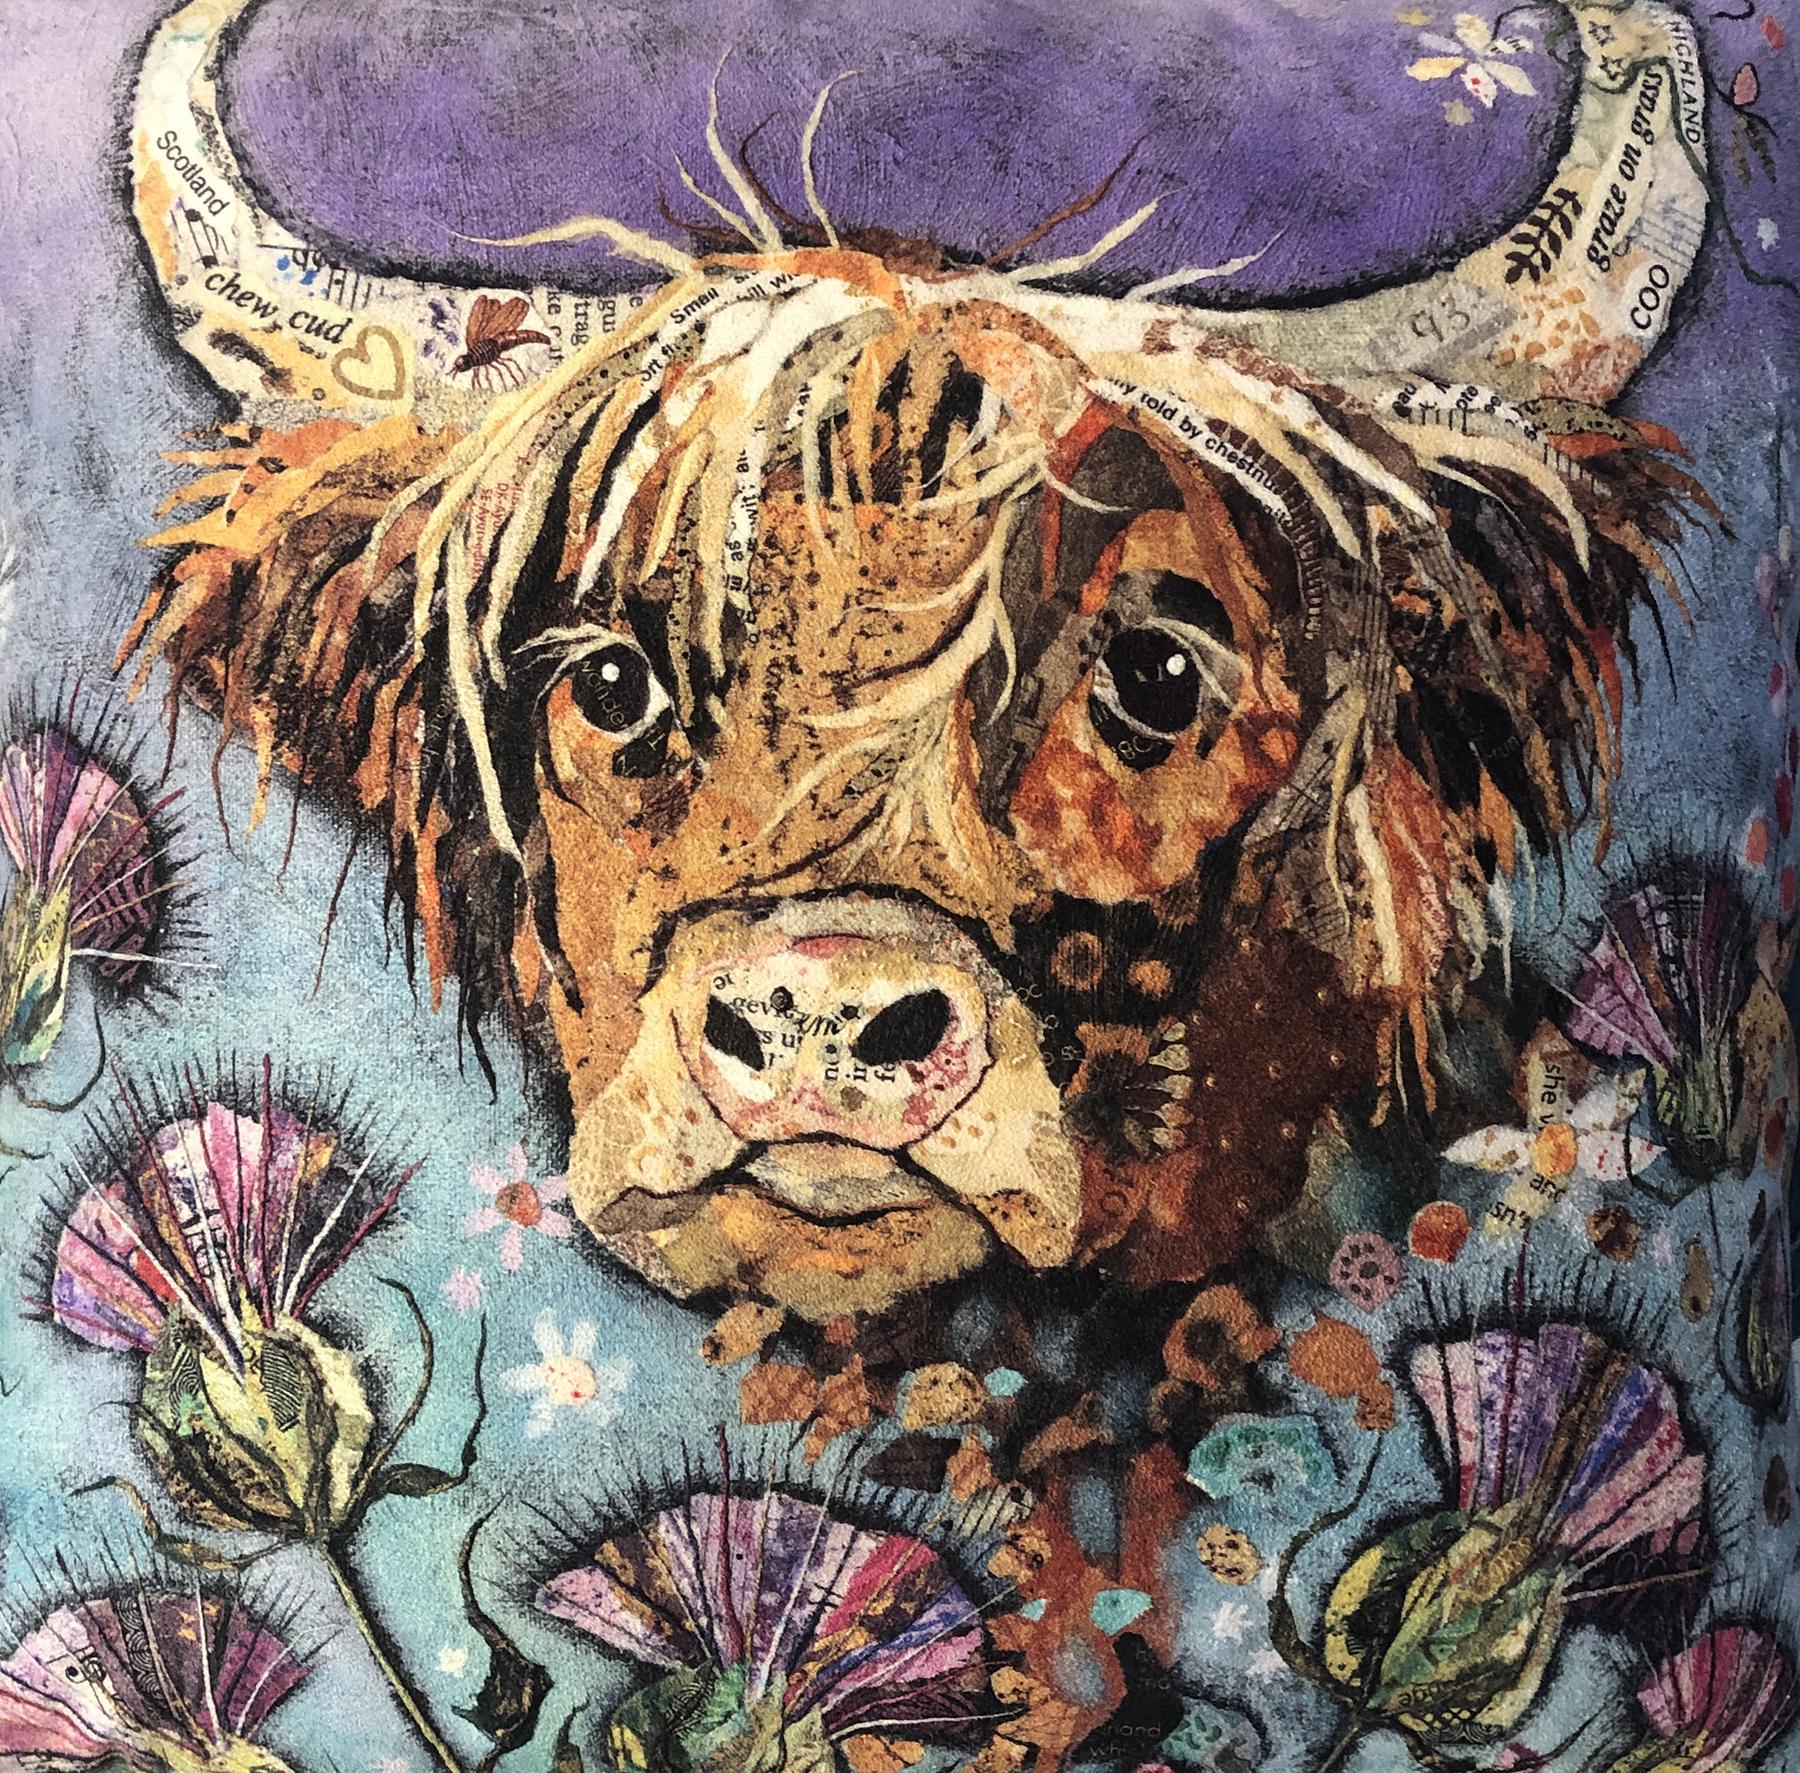 Dawn Maciocia - painted paper artist at the farthing gallery kenilworth